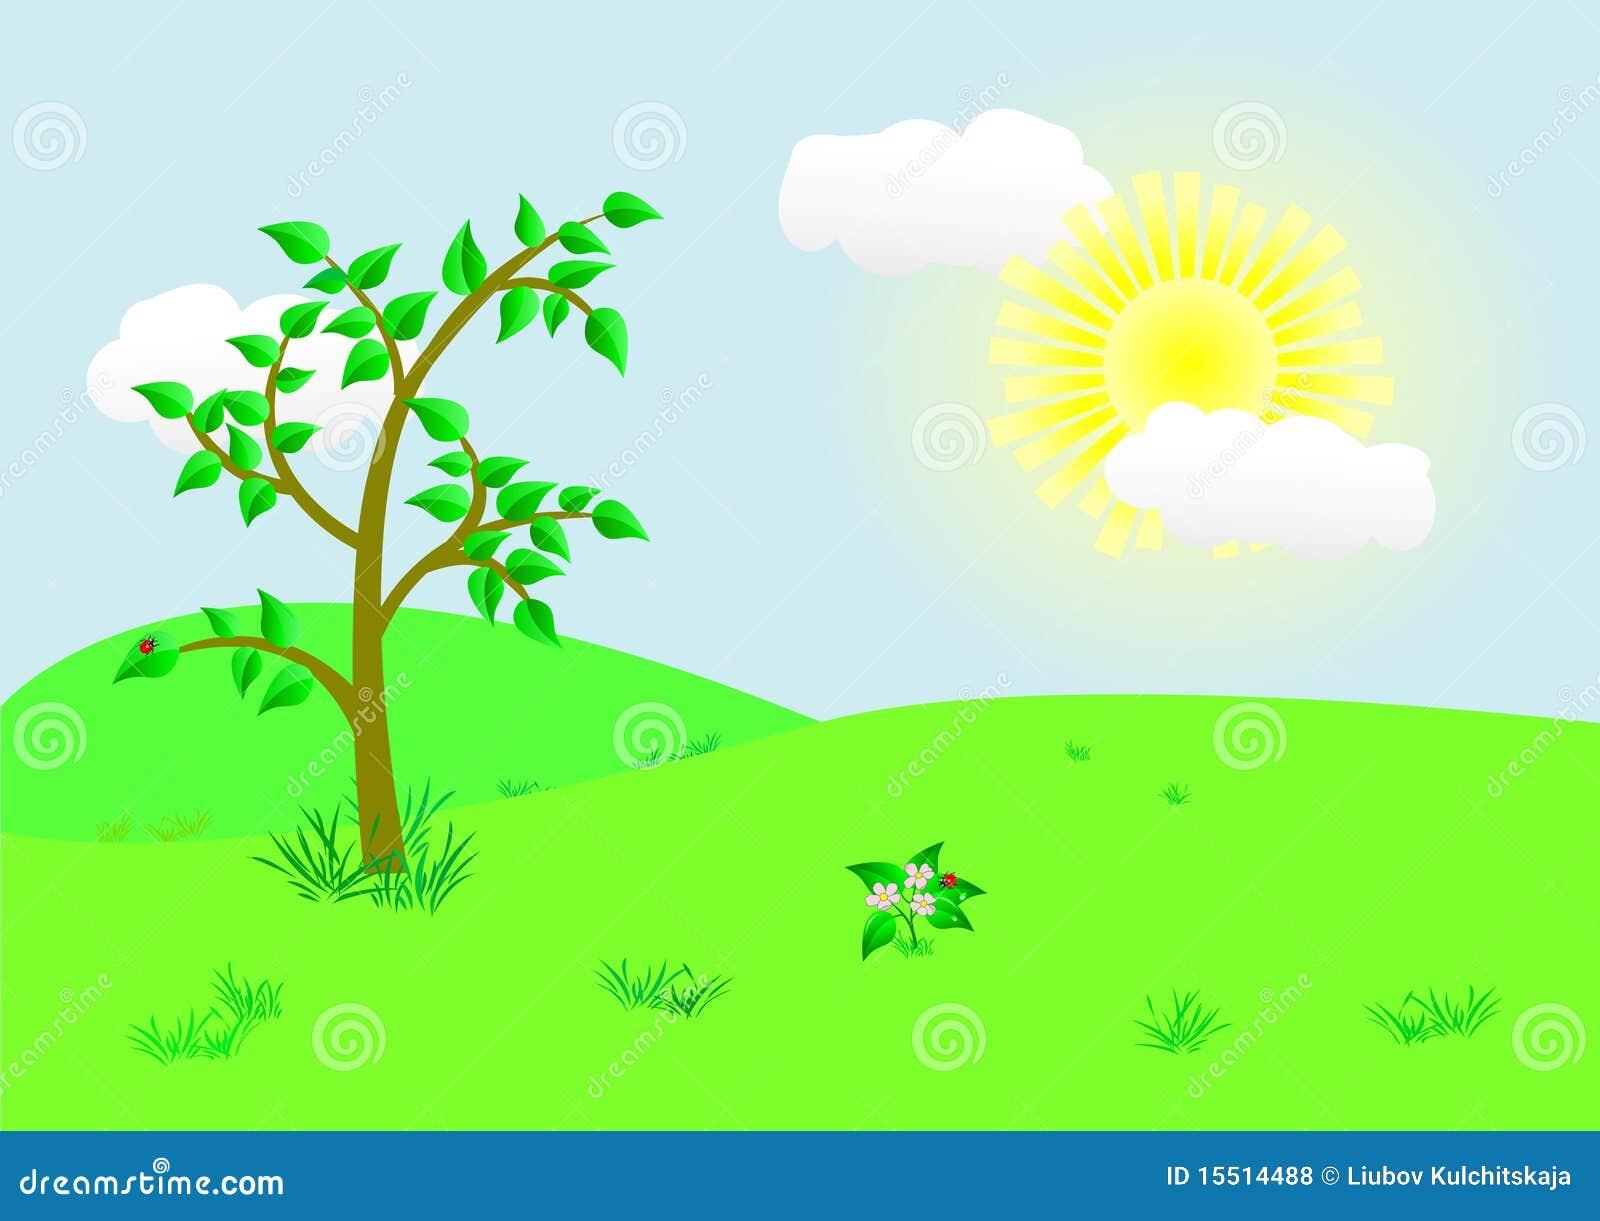 Landscape Illustration Vector Free: Beautiful Landscape. Vector Illustration. Royalty Free